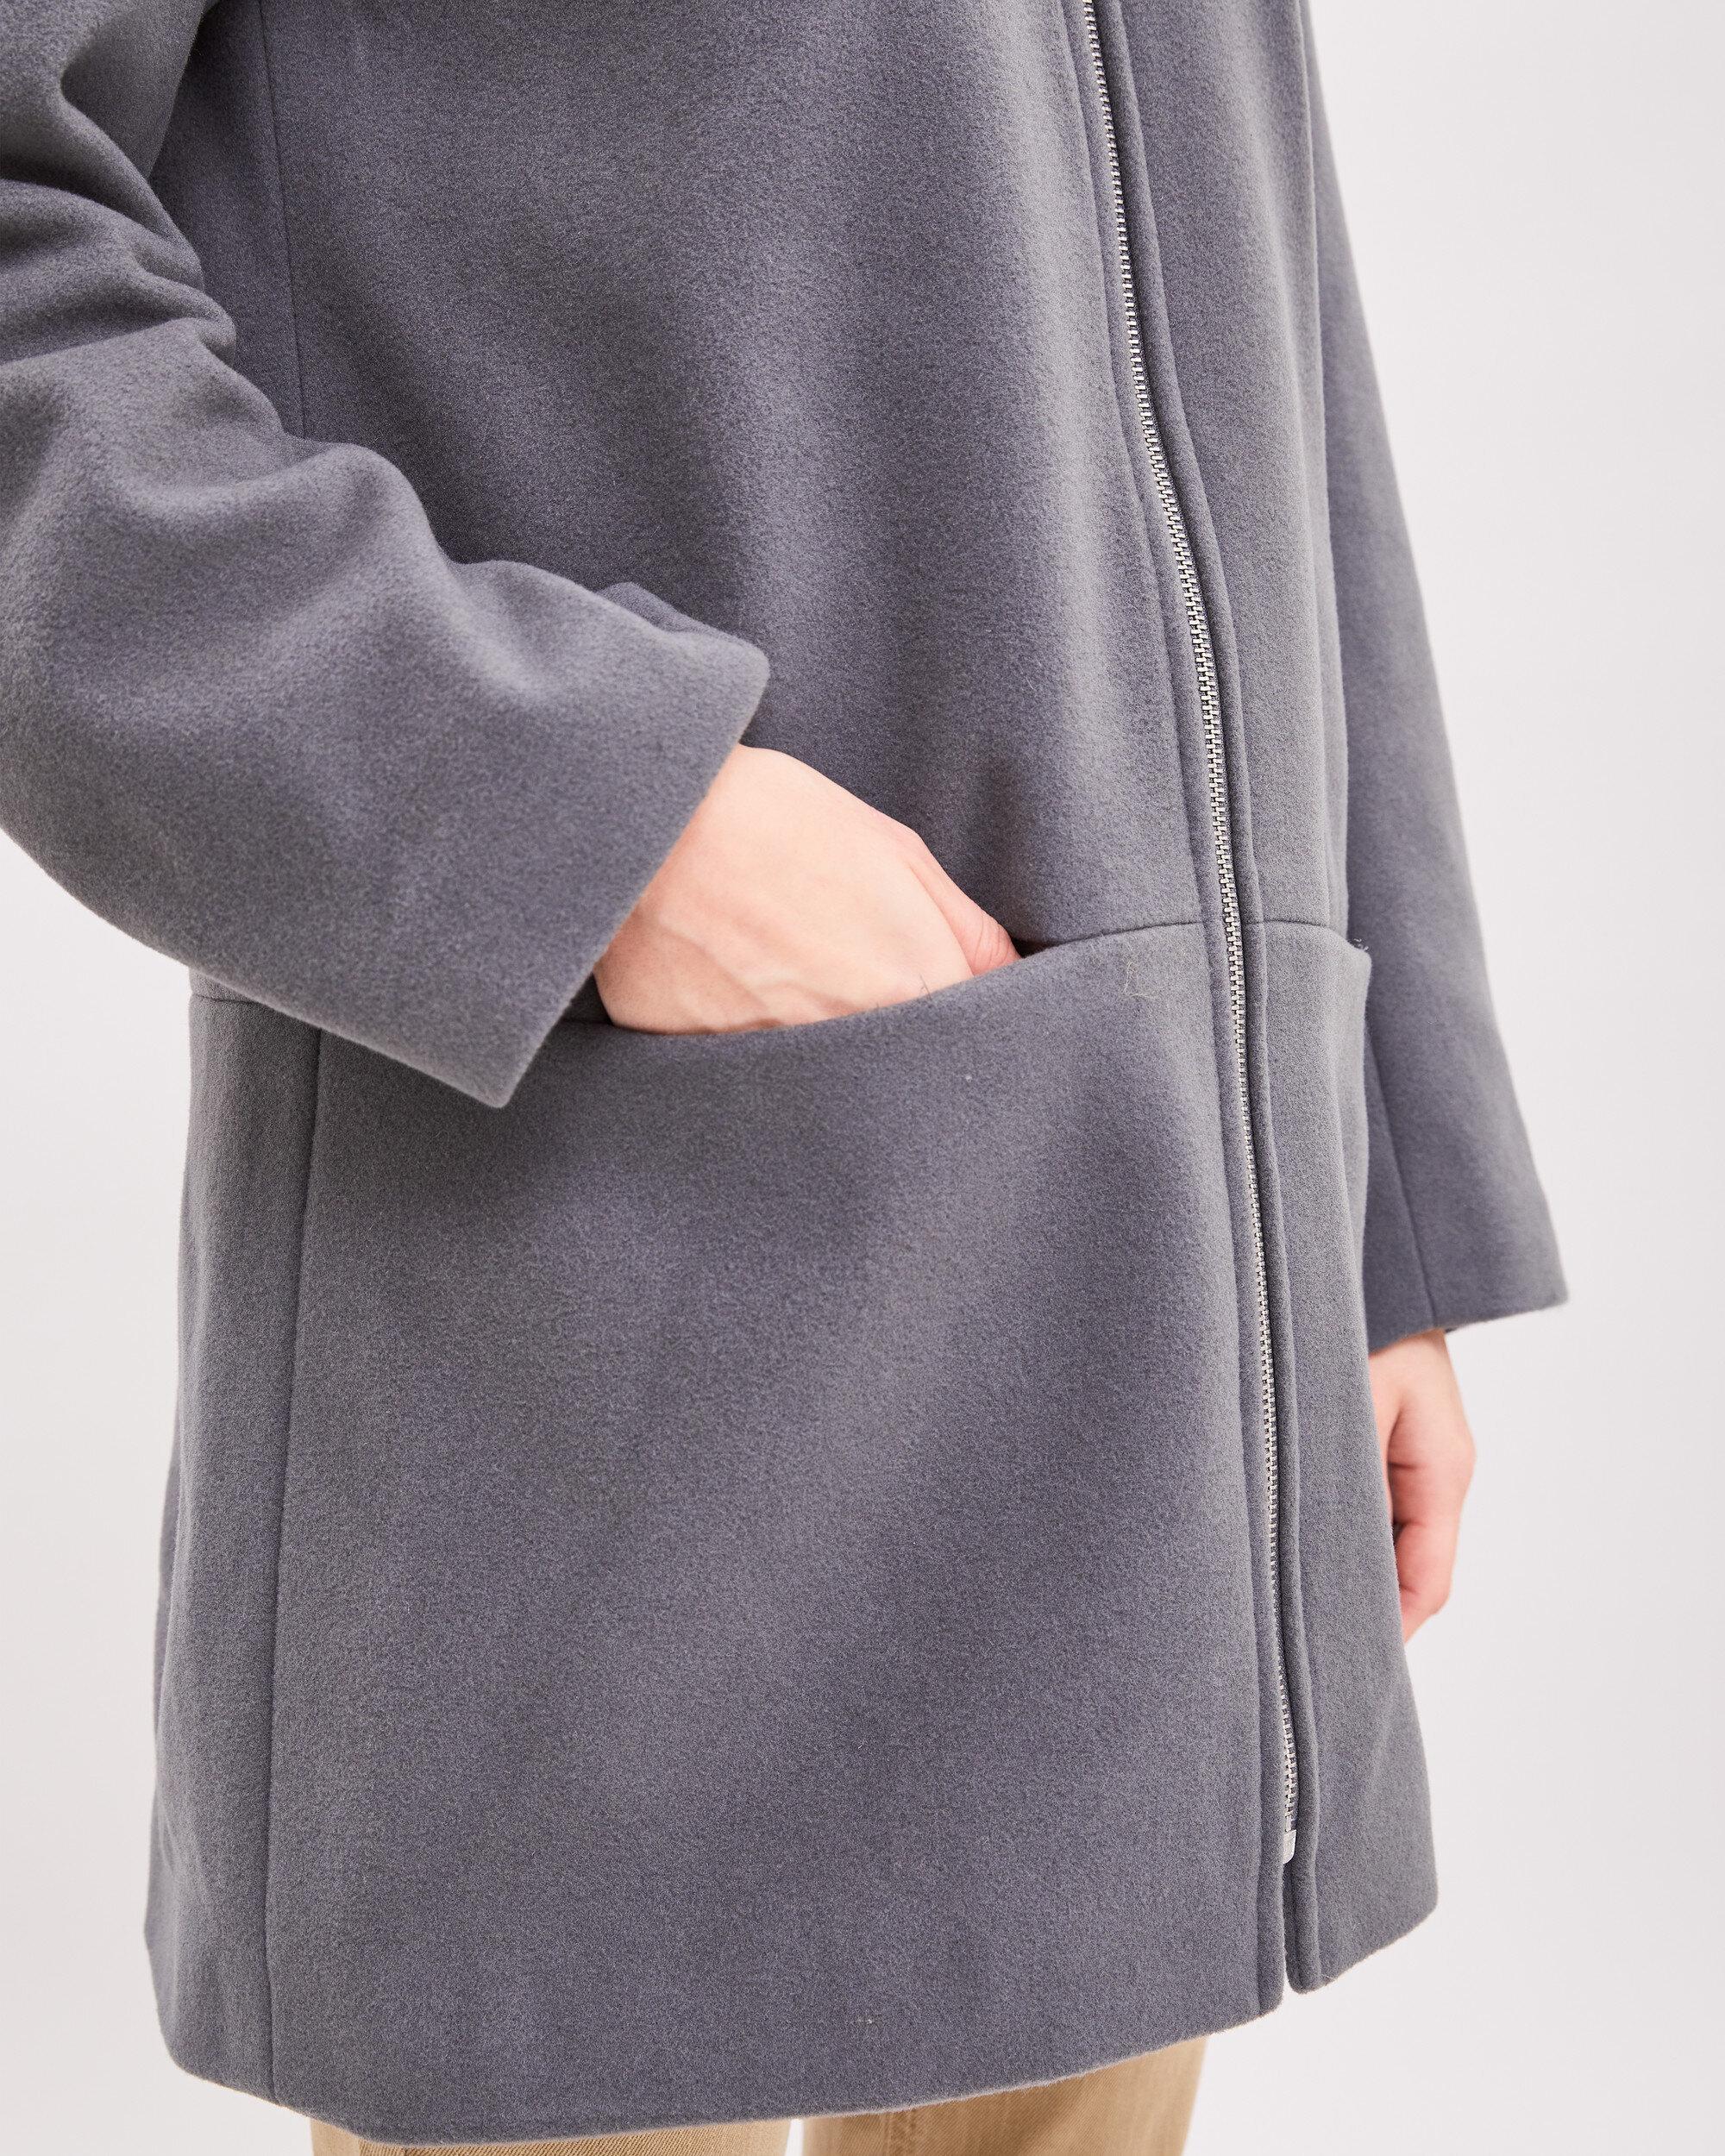 The Zipper